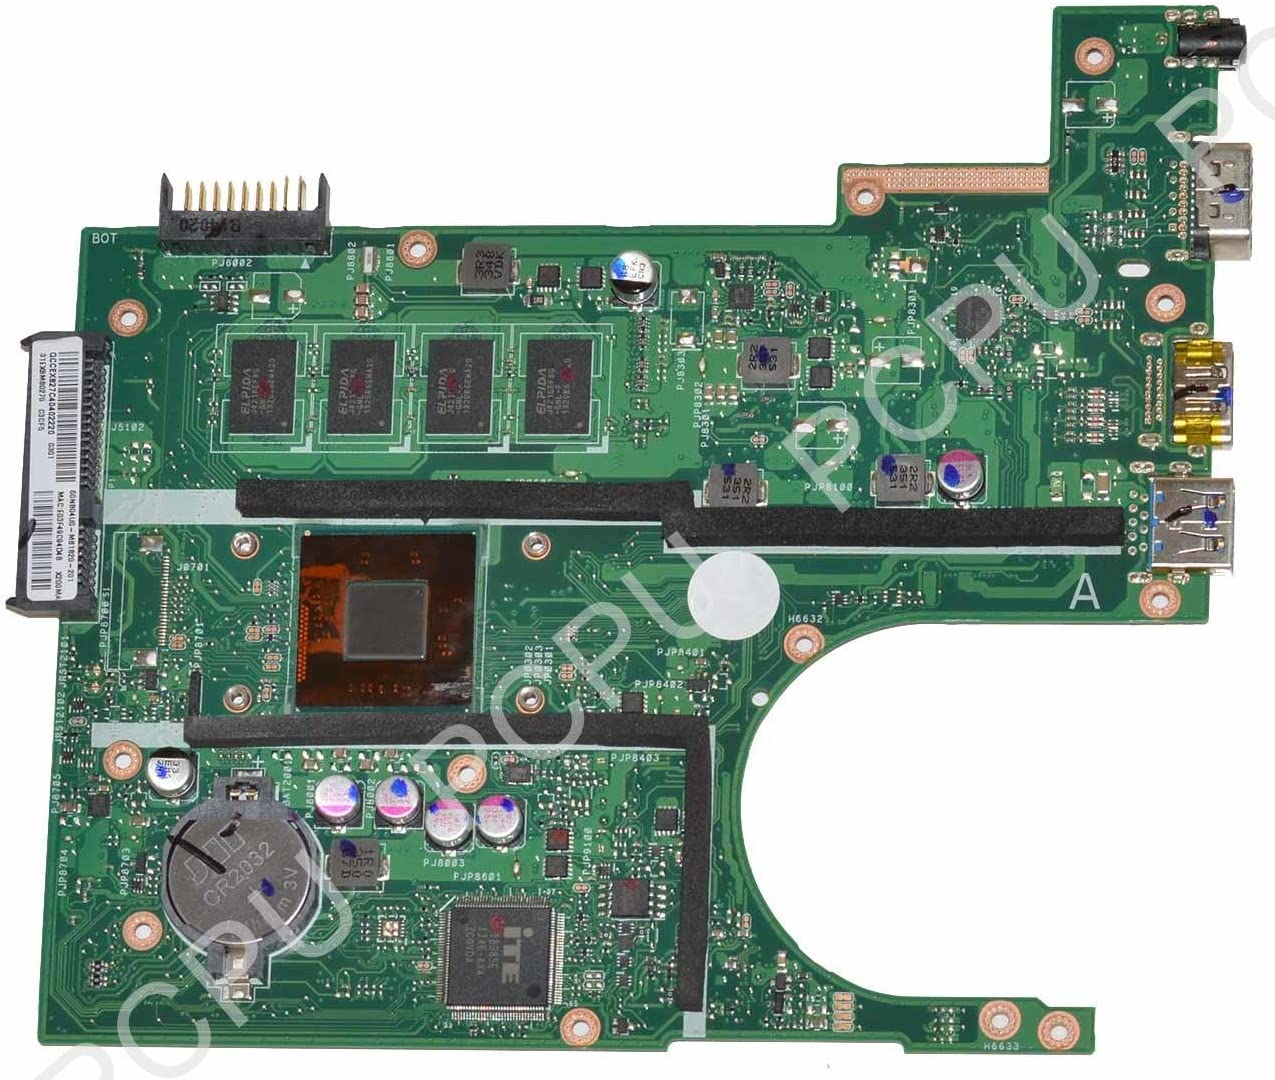 Finally resale start 60NB04U0-MB1B20 Asus X200MA Laptop Motherboard Max 72% OFF Celer w 4GB Intel